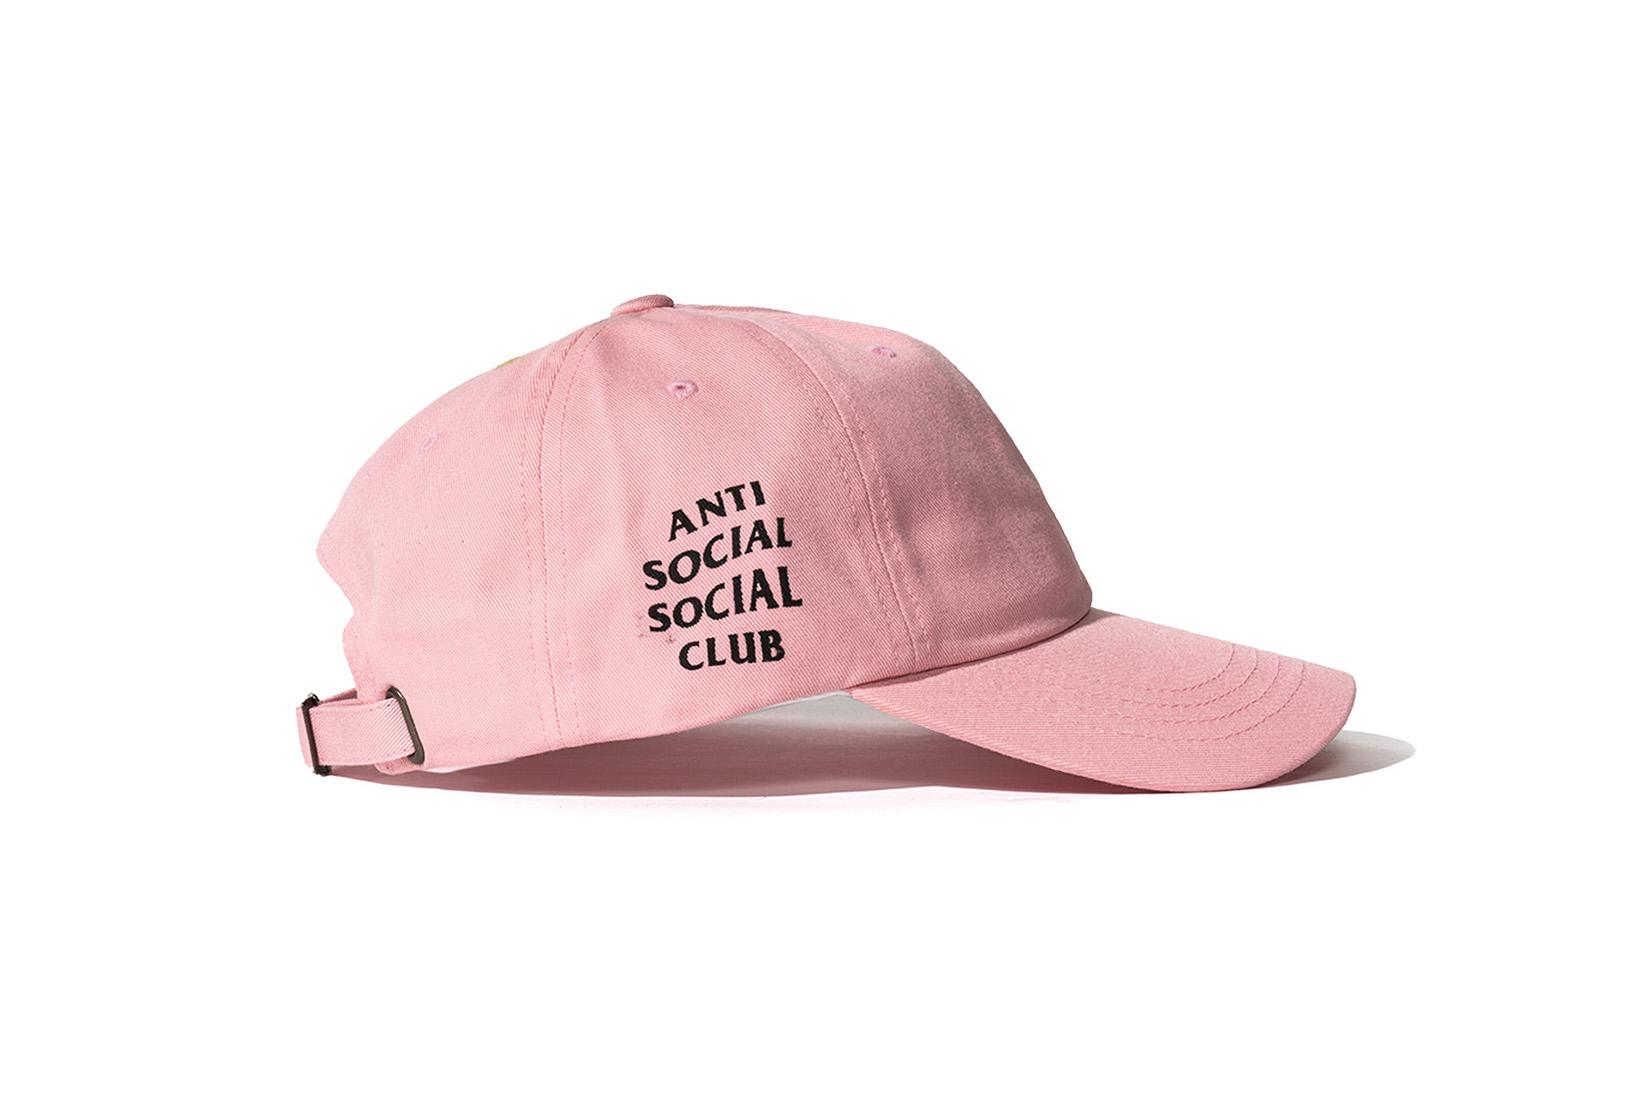 Anti Social Social Club 2017 Spring Summer - 3744382